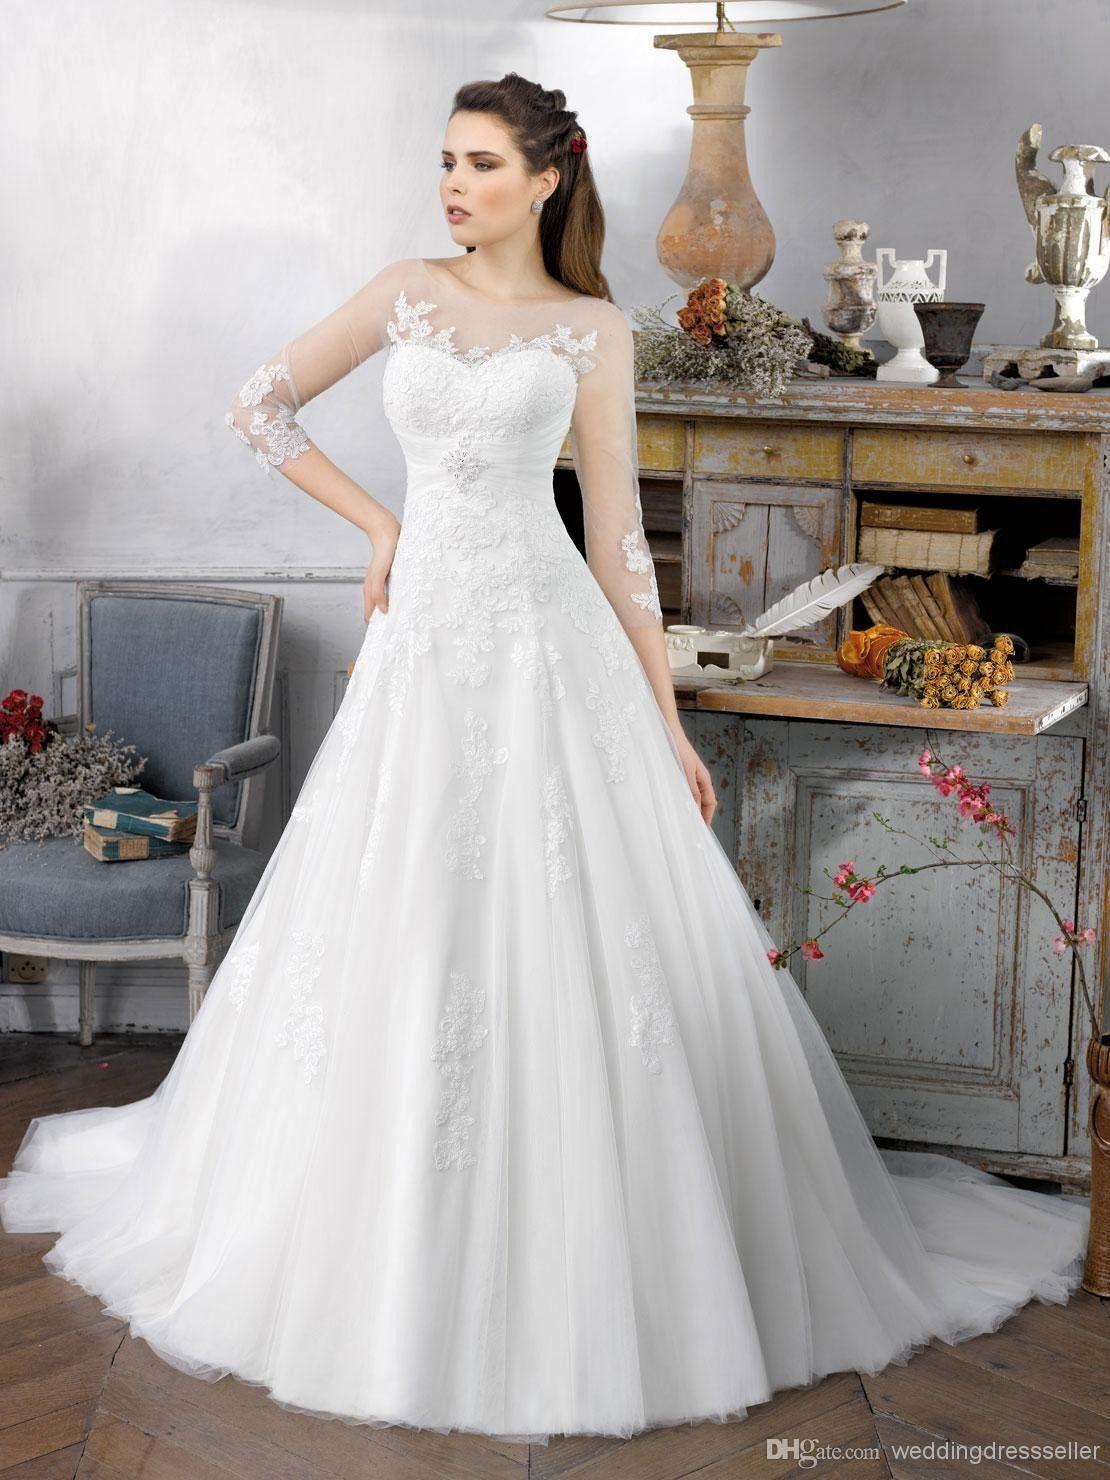 2014 A Line Organza Appliques Long Sleeves Zipper Bridal Gown Wedding Dress